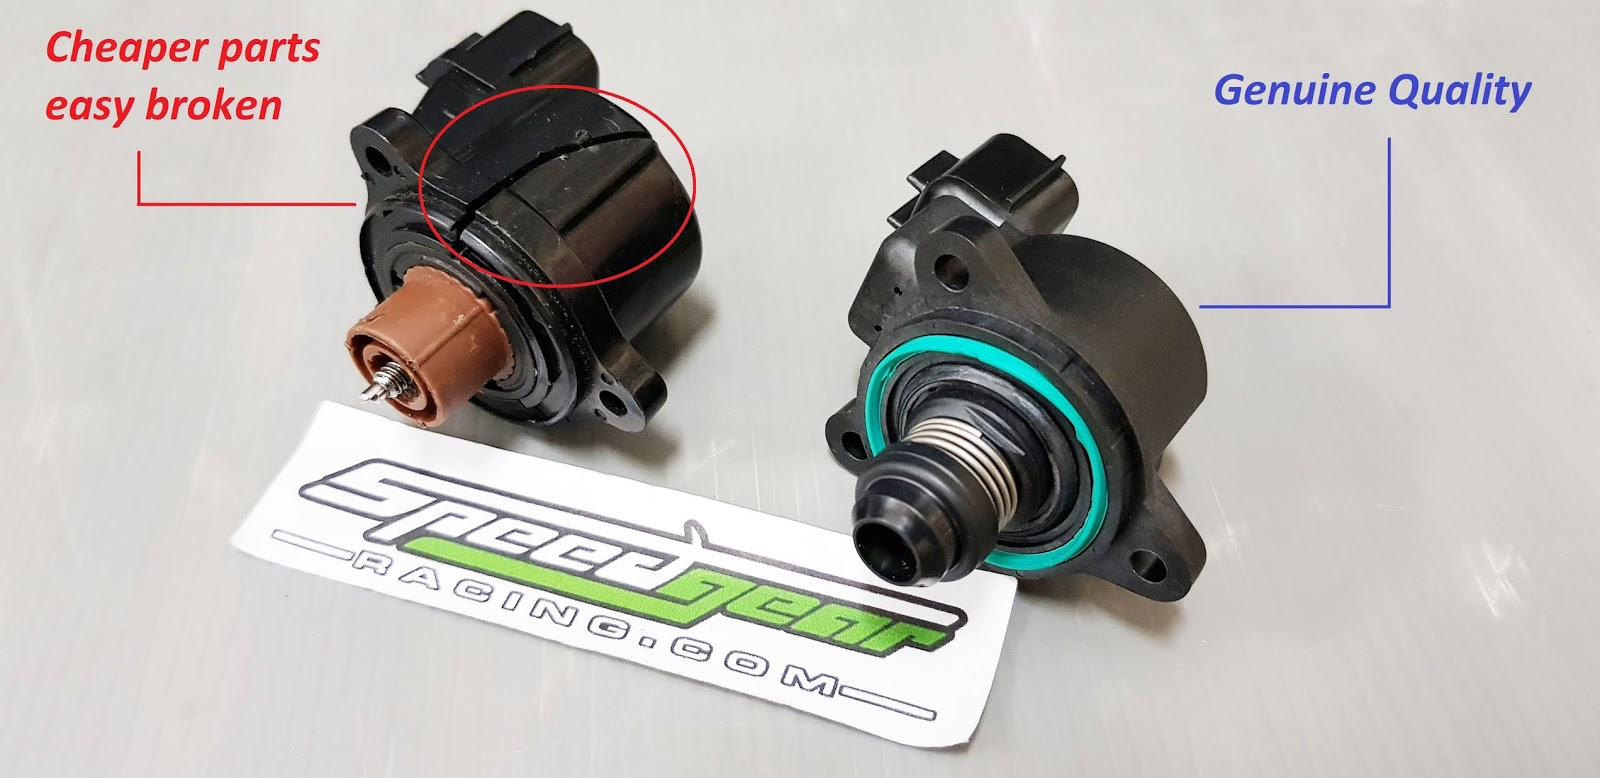 Speedgear Racing: Stepper motor Idle valve 4G63 4G63T Lancer EVO 1 2